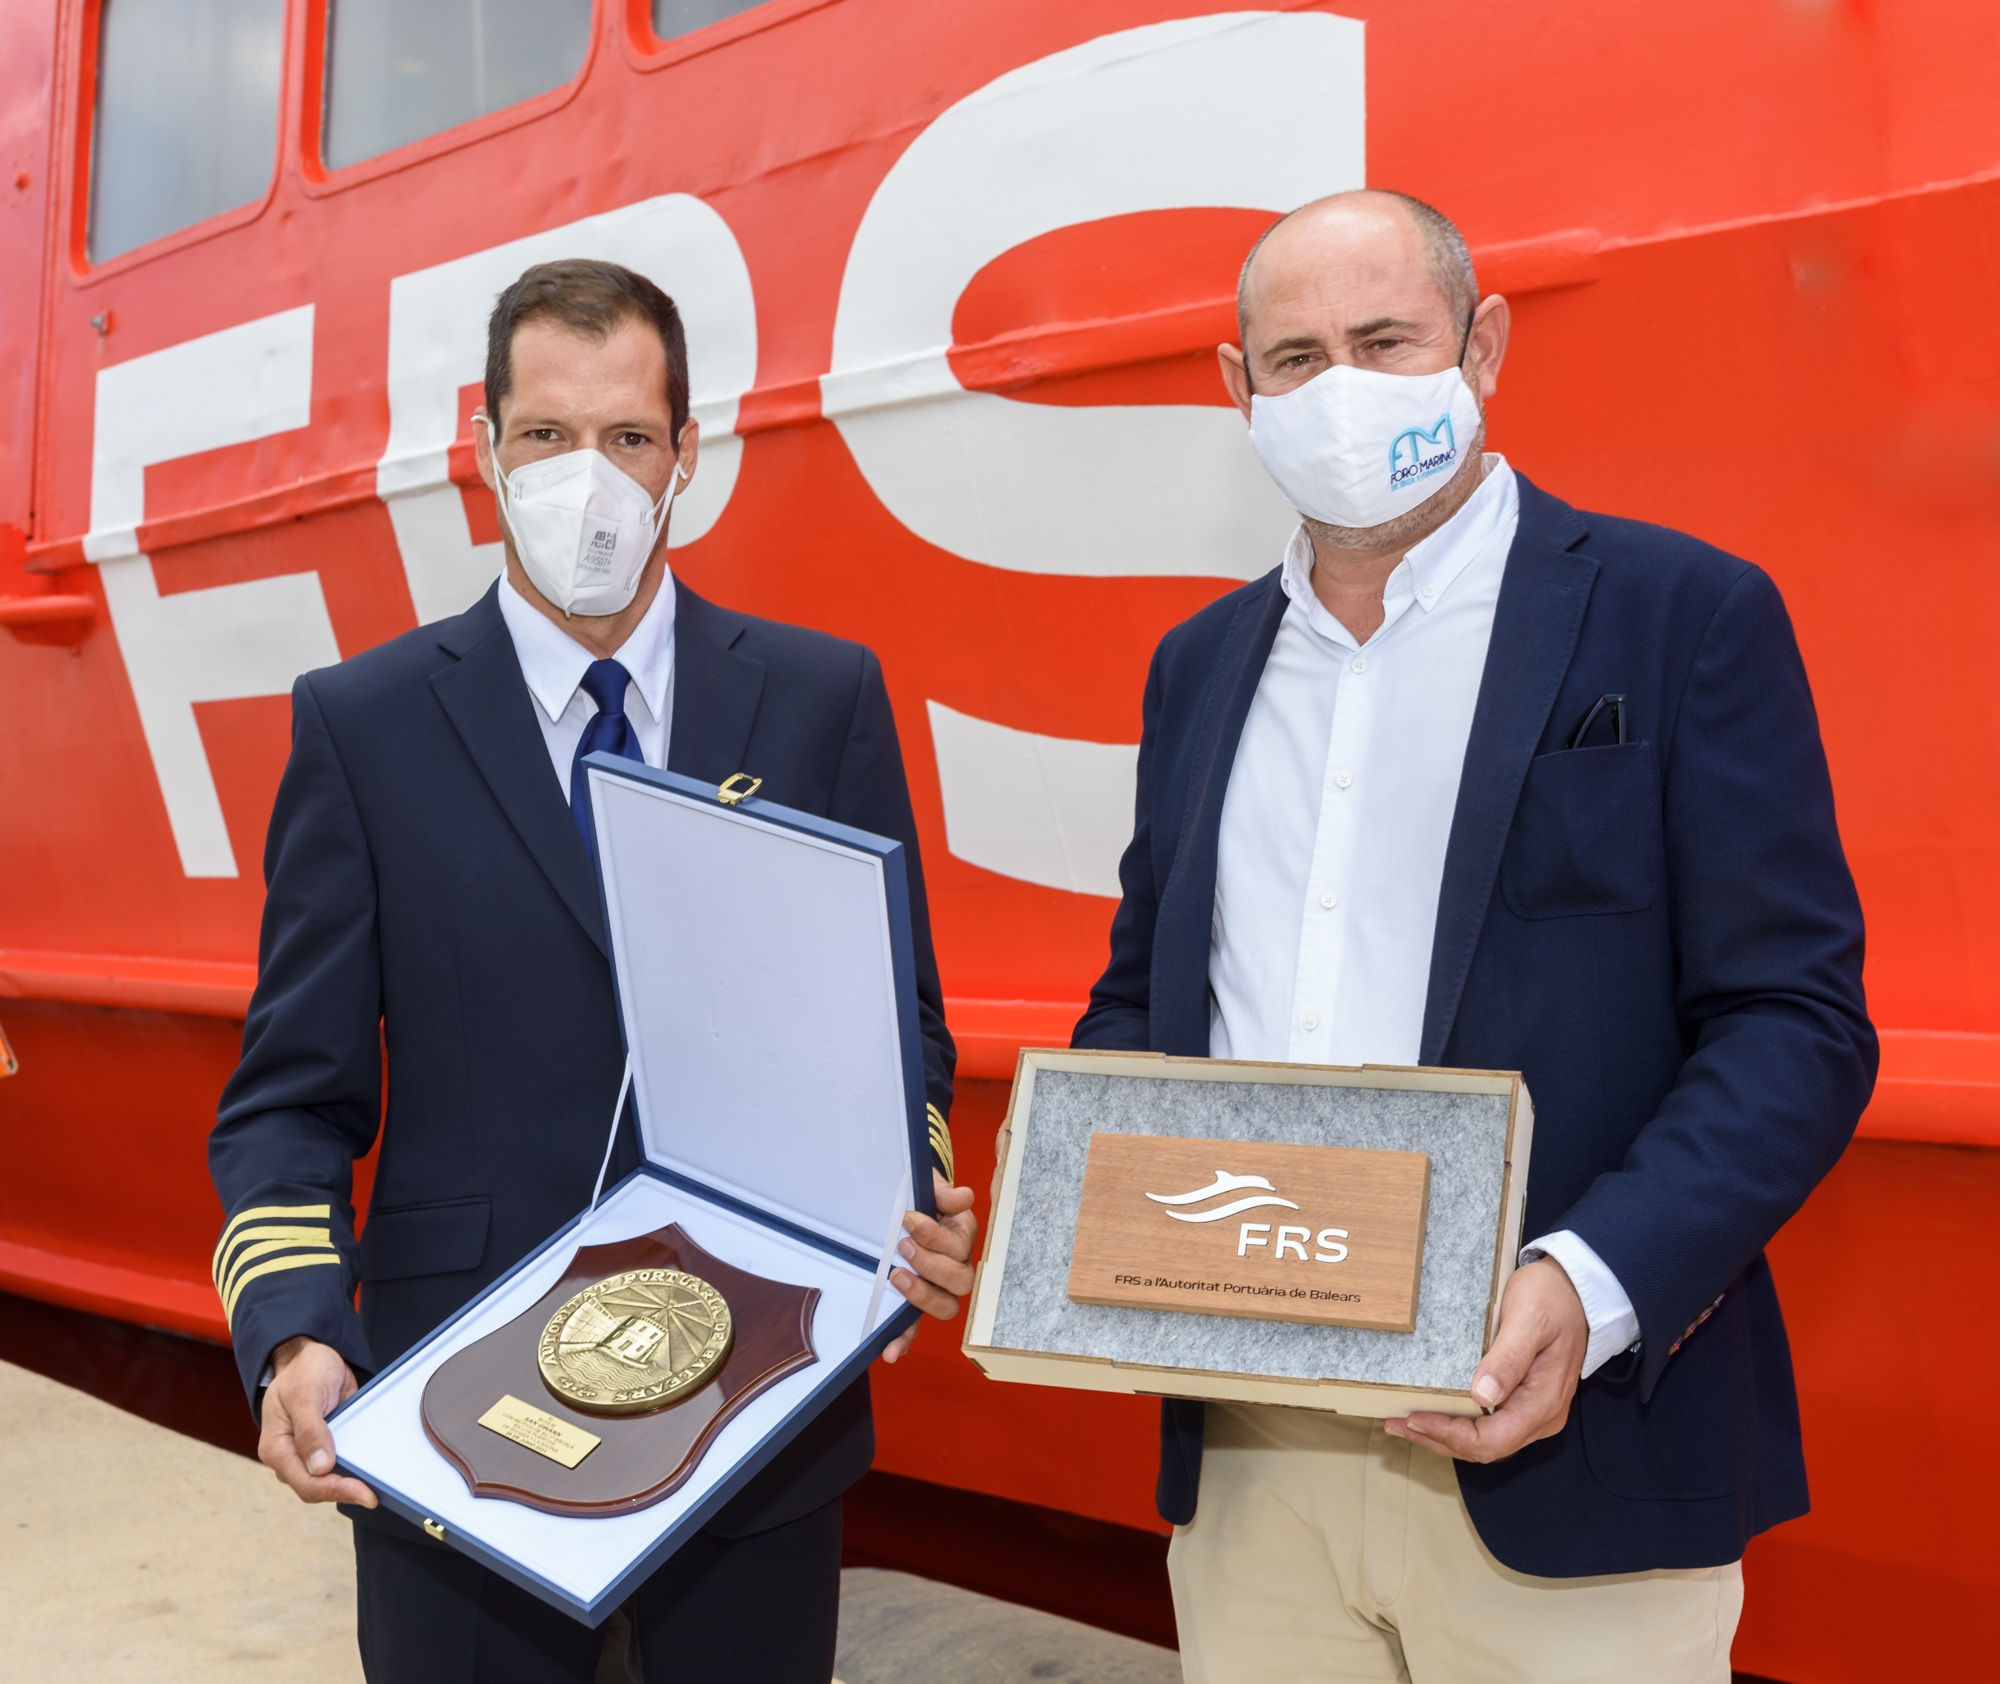 La naviera FRS presenta la ruta Ibiza-Formentera